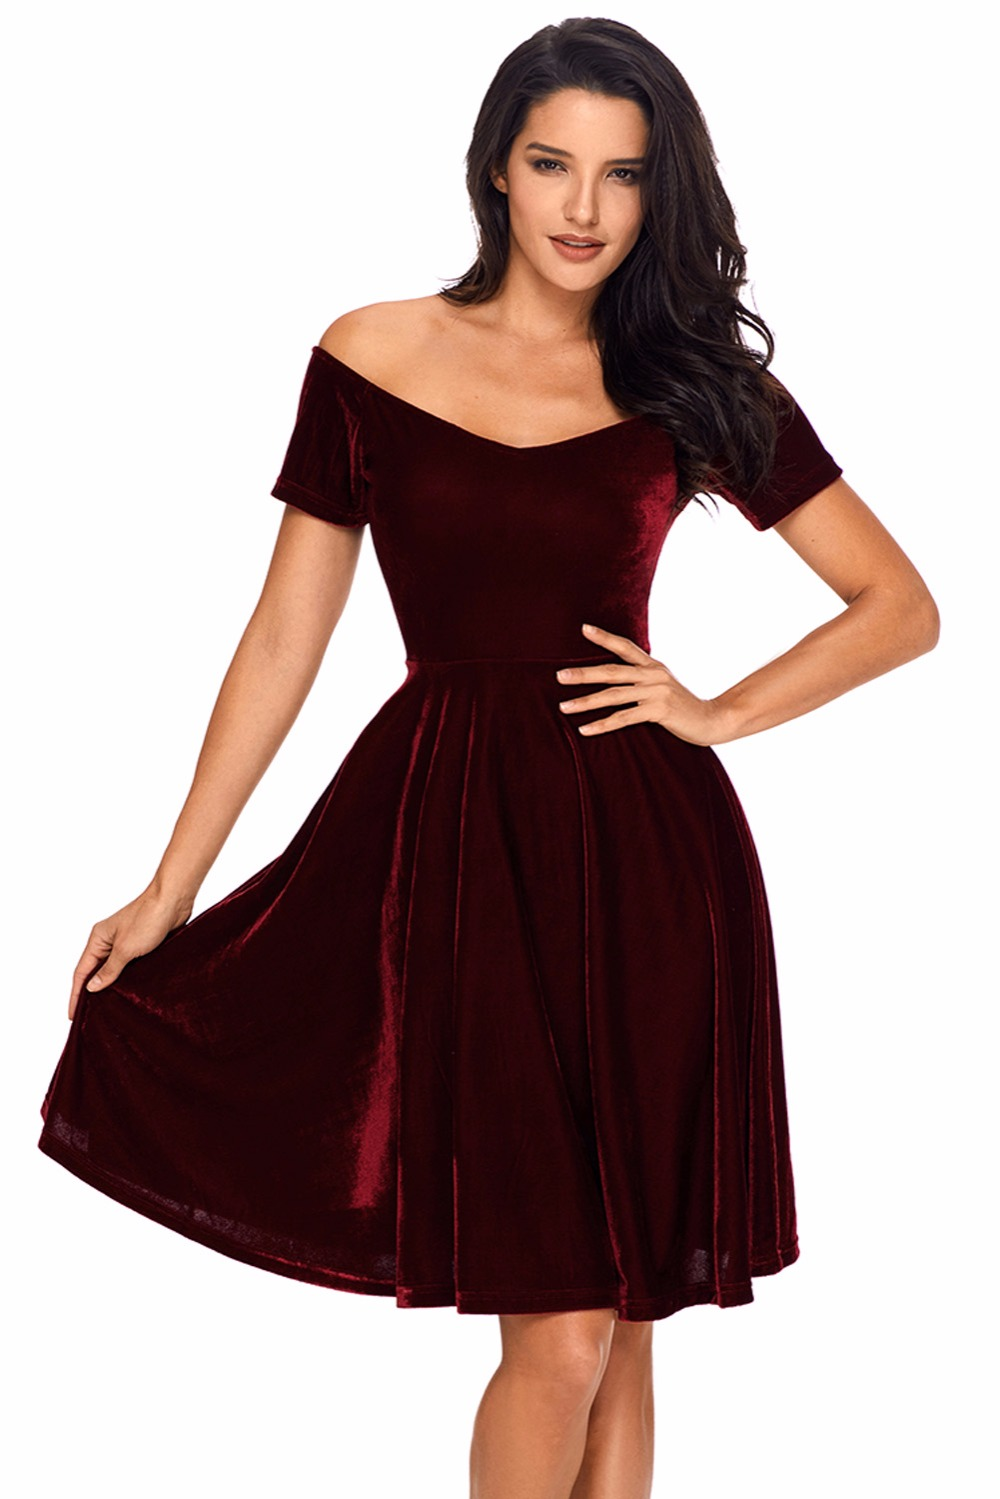 8a44653ca5d96 Dear Lover Velvet Dresses 2018 Sexy Womens Party Vestidos de Festa Off  Shoulder Burgundy Pleated Midi Dress Robe Velours LC61861